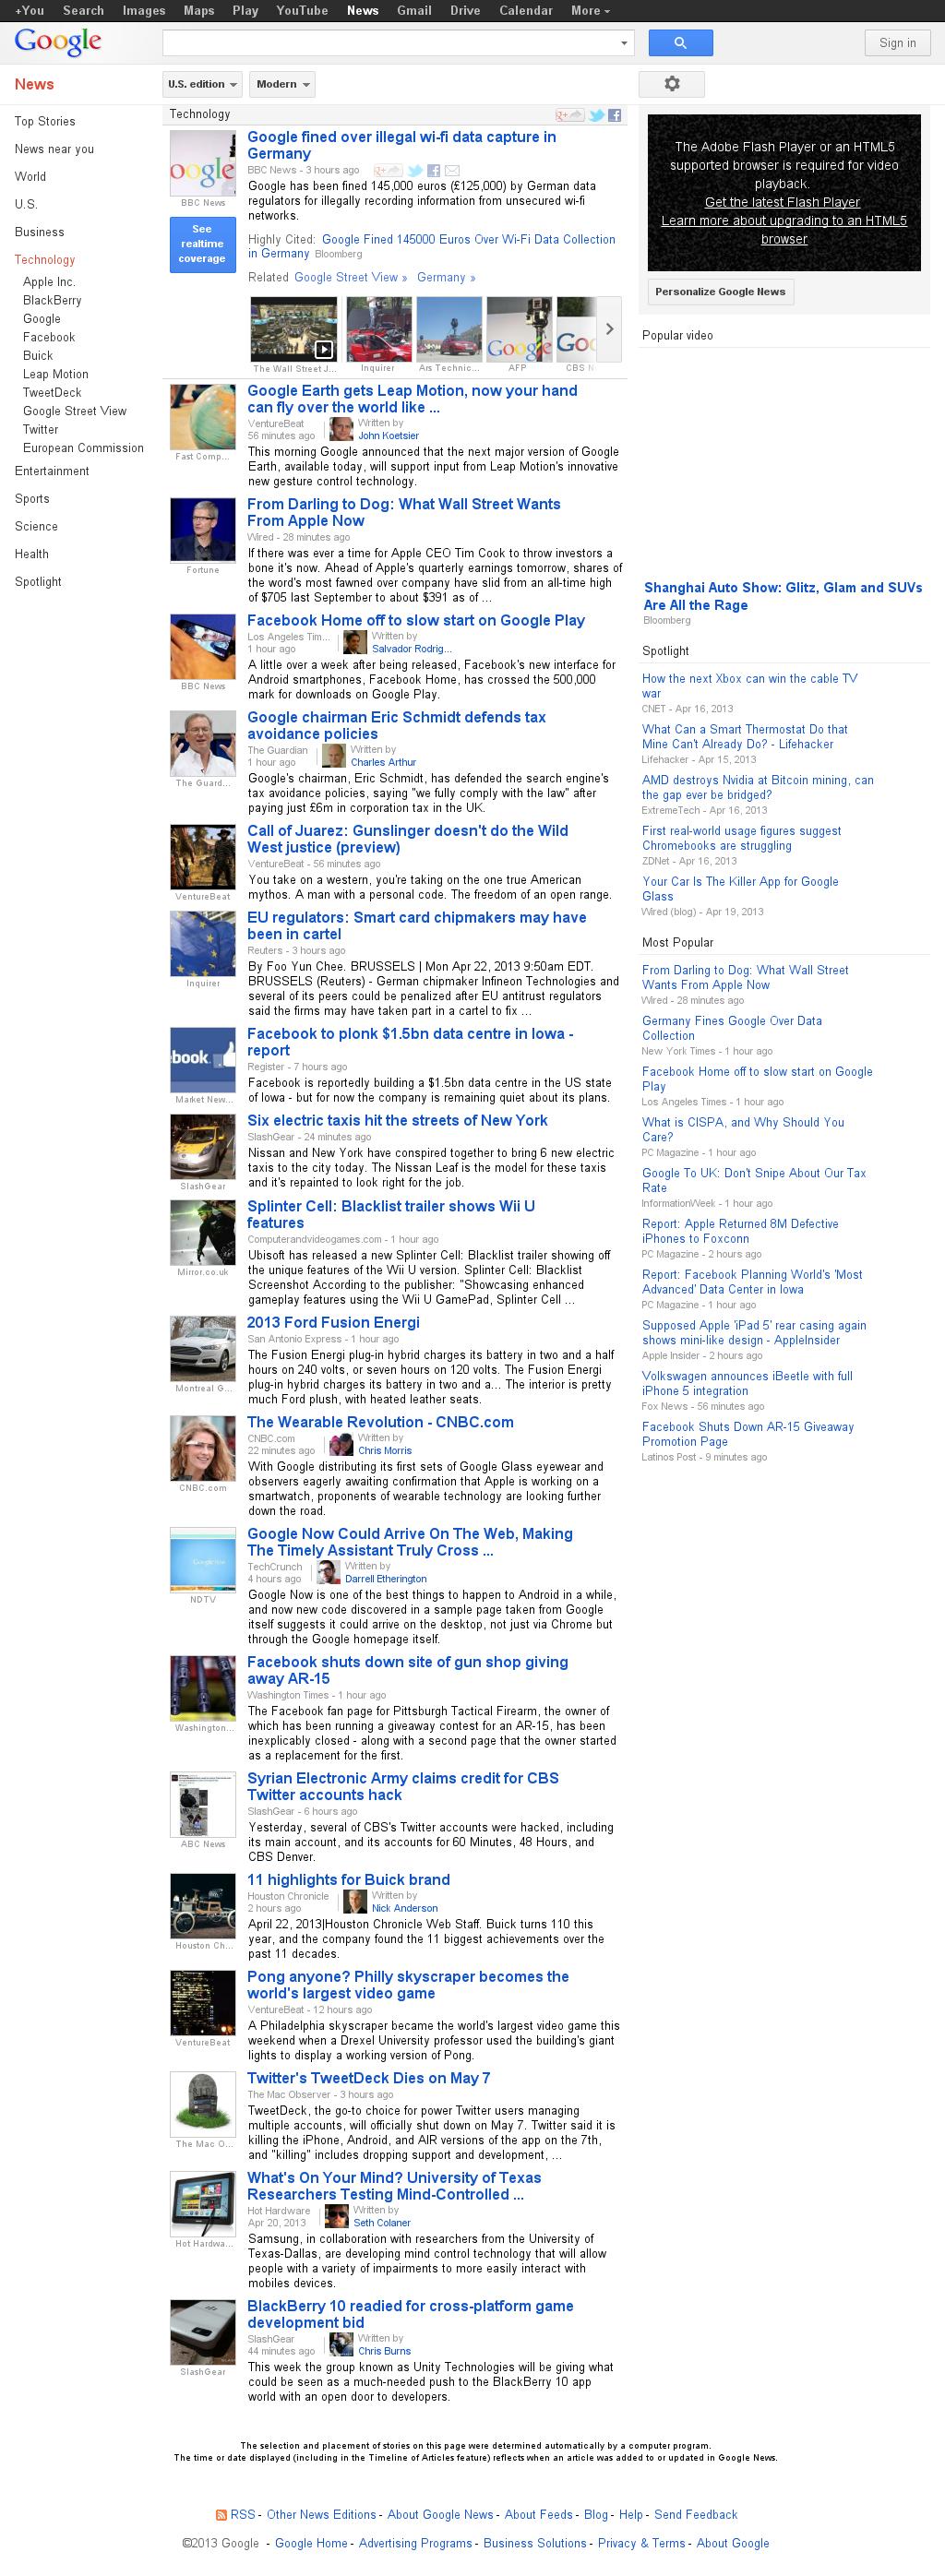 Google News: Technology at Monday April 22, 2013, 5:08 p.m. UTC